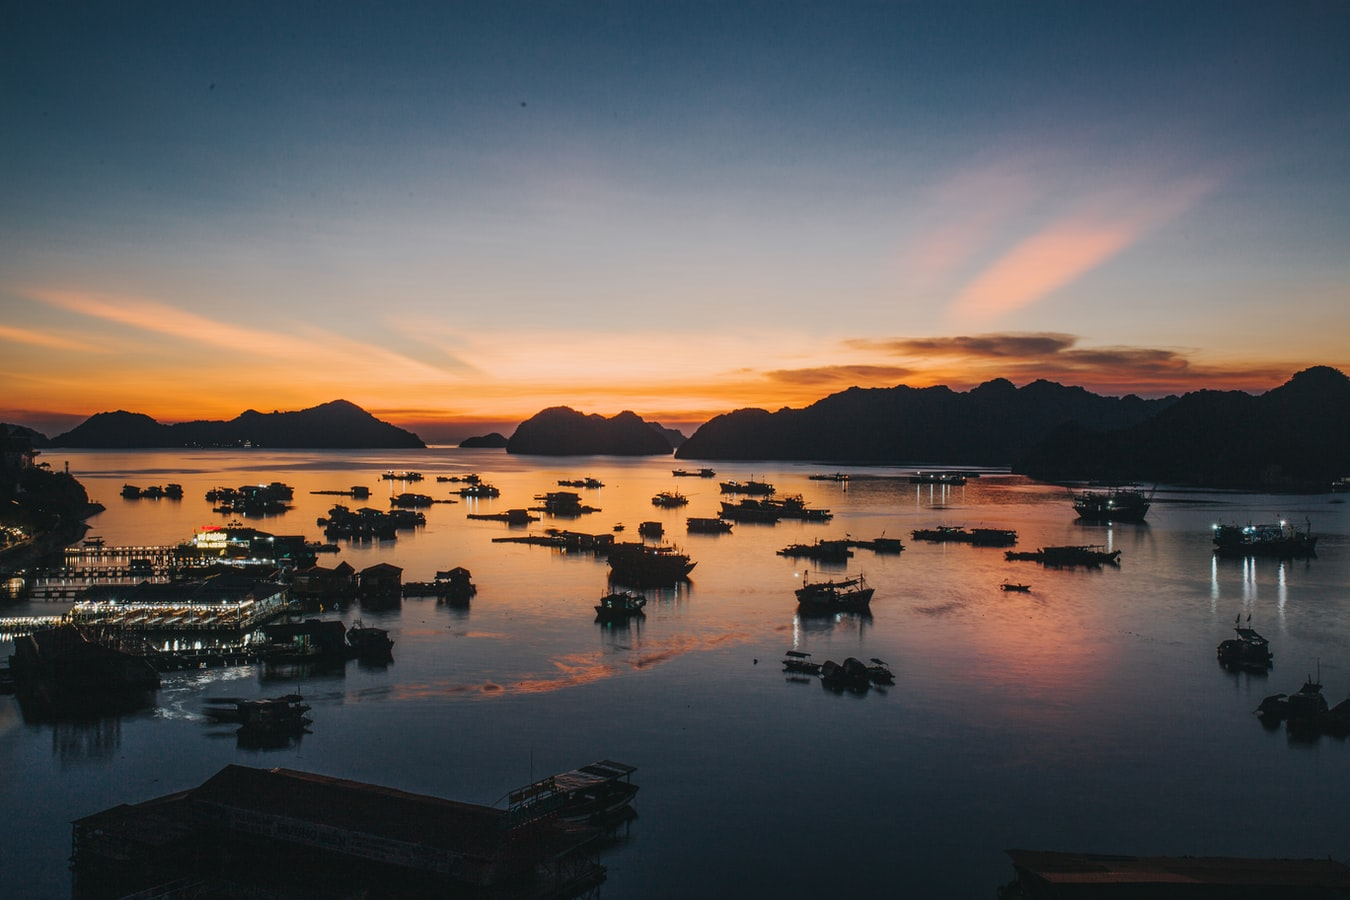 Sonnenuntergang vor Cát Bà Island Vietnam